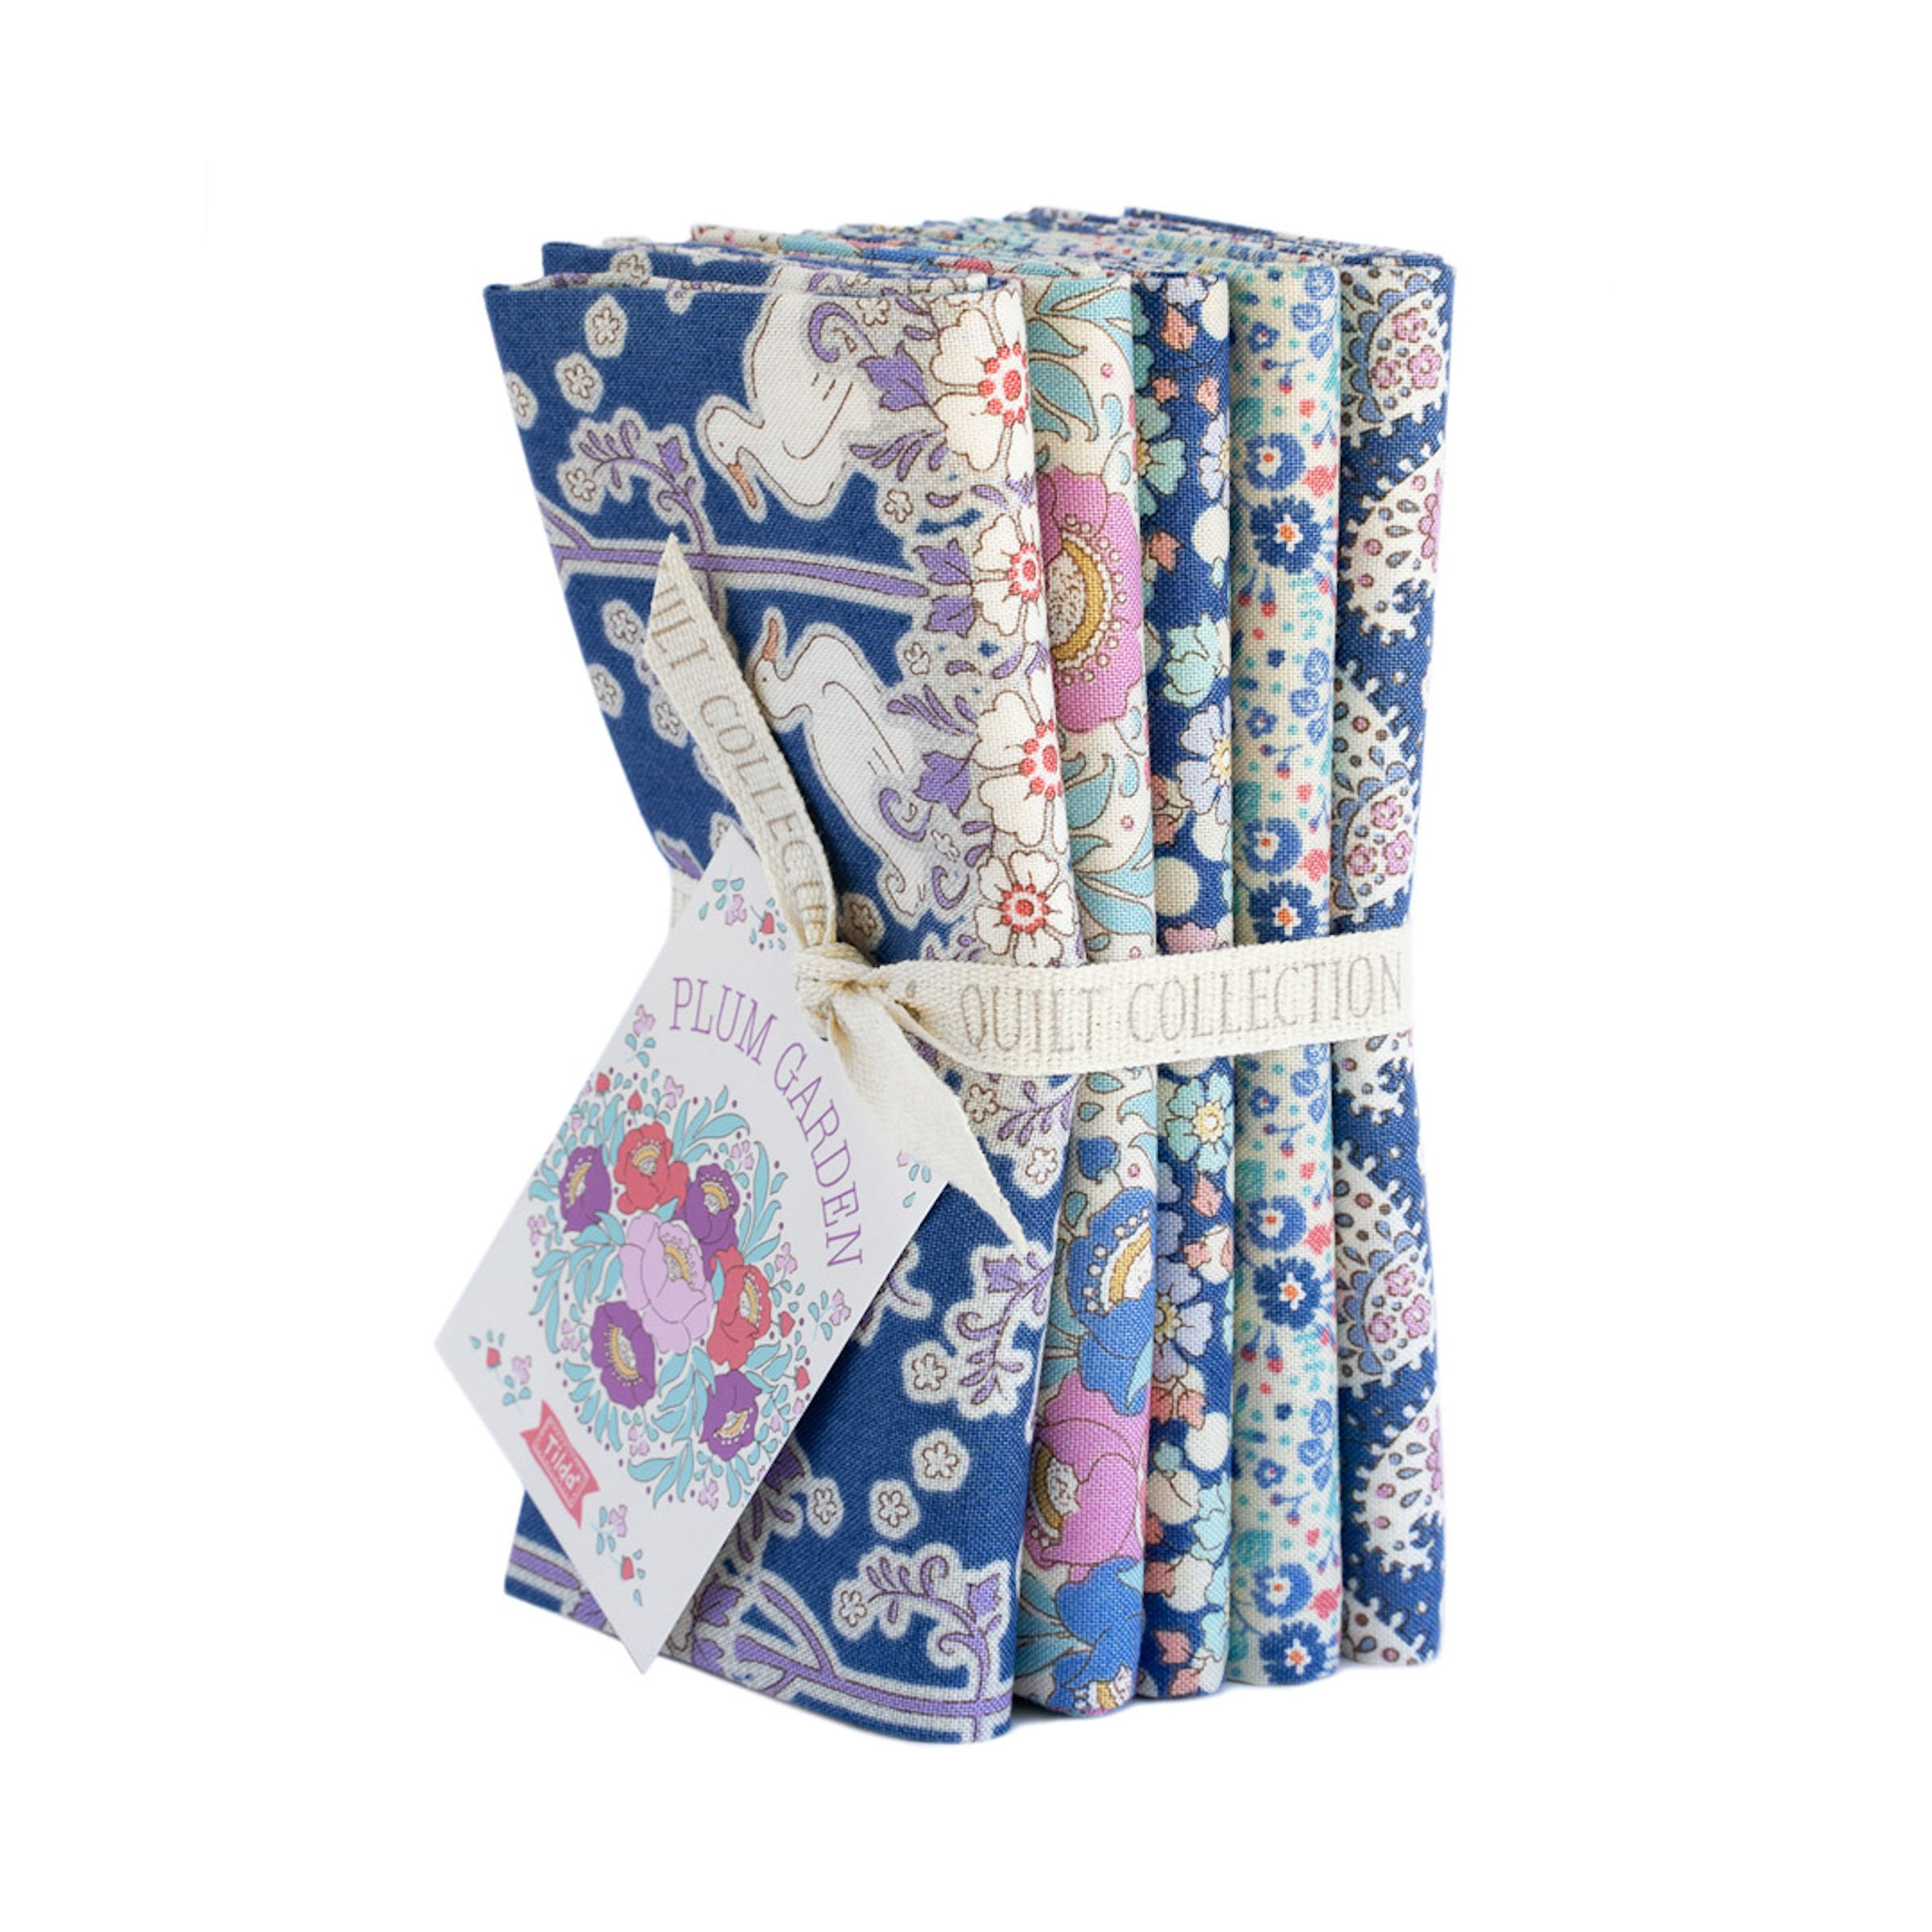 Creatieve Hobby S Red Cotton Fabric Tilda Plum Garden Metre Fat Quarter Windflower Tissues Thinkinganglicans Org Uk